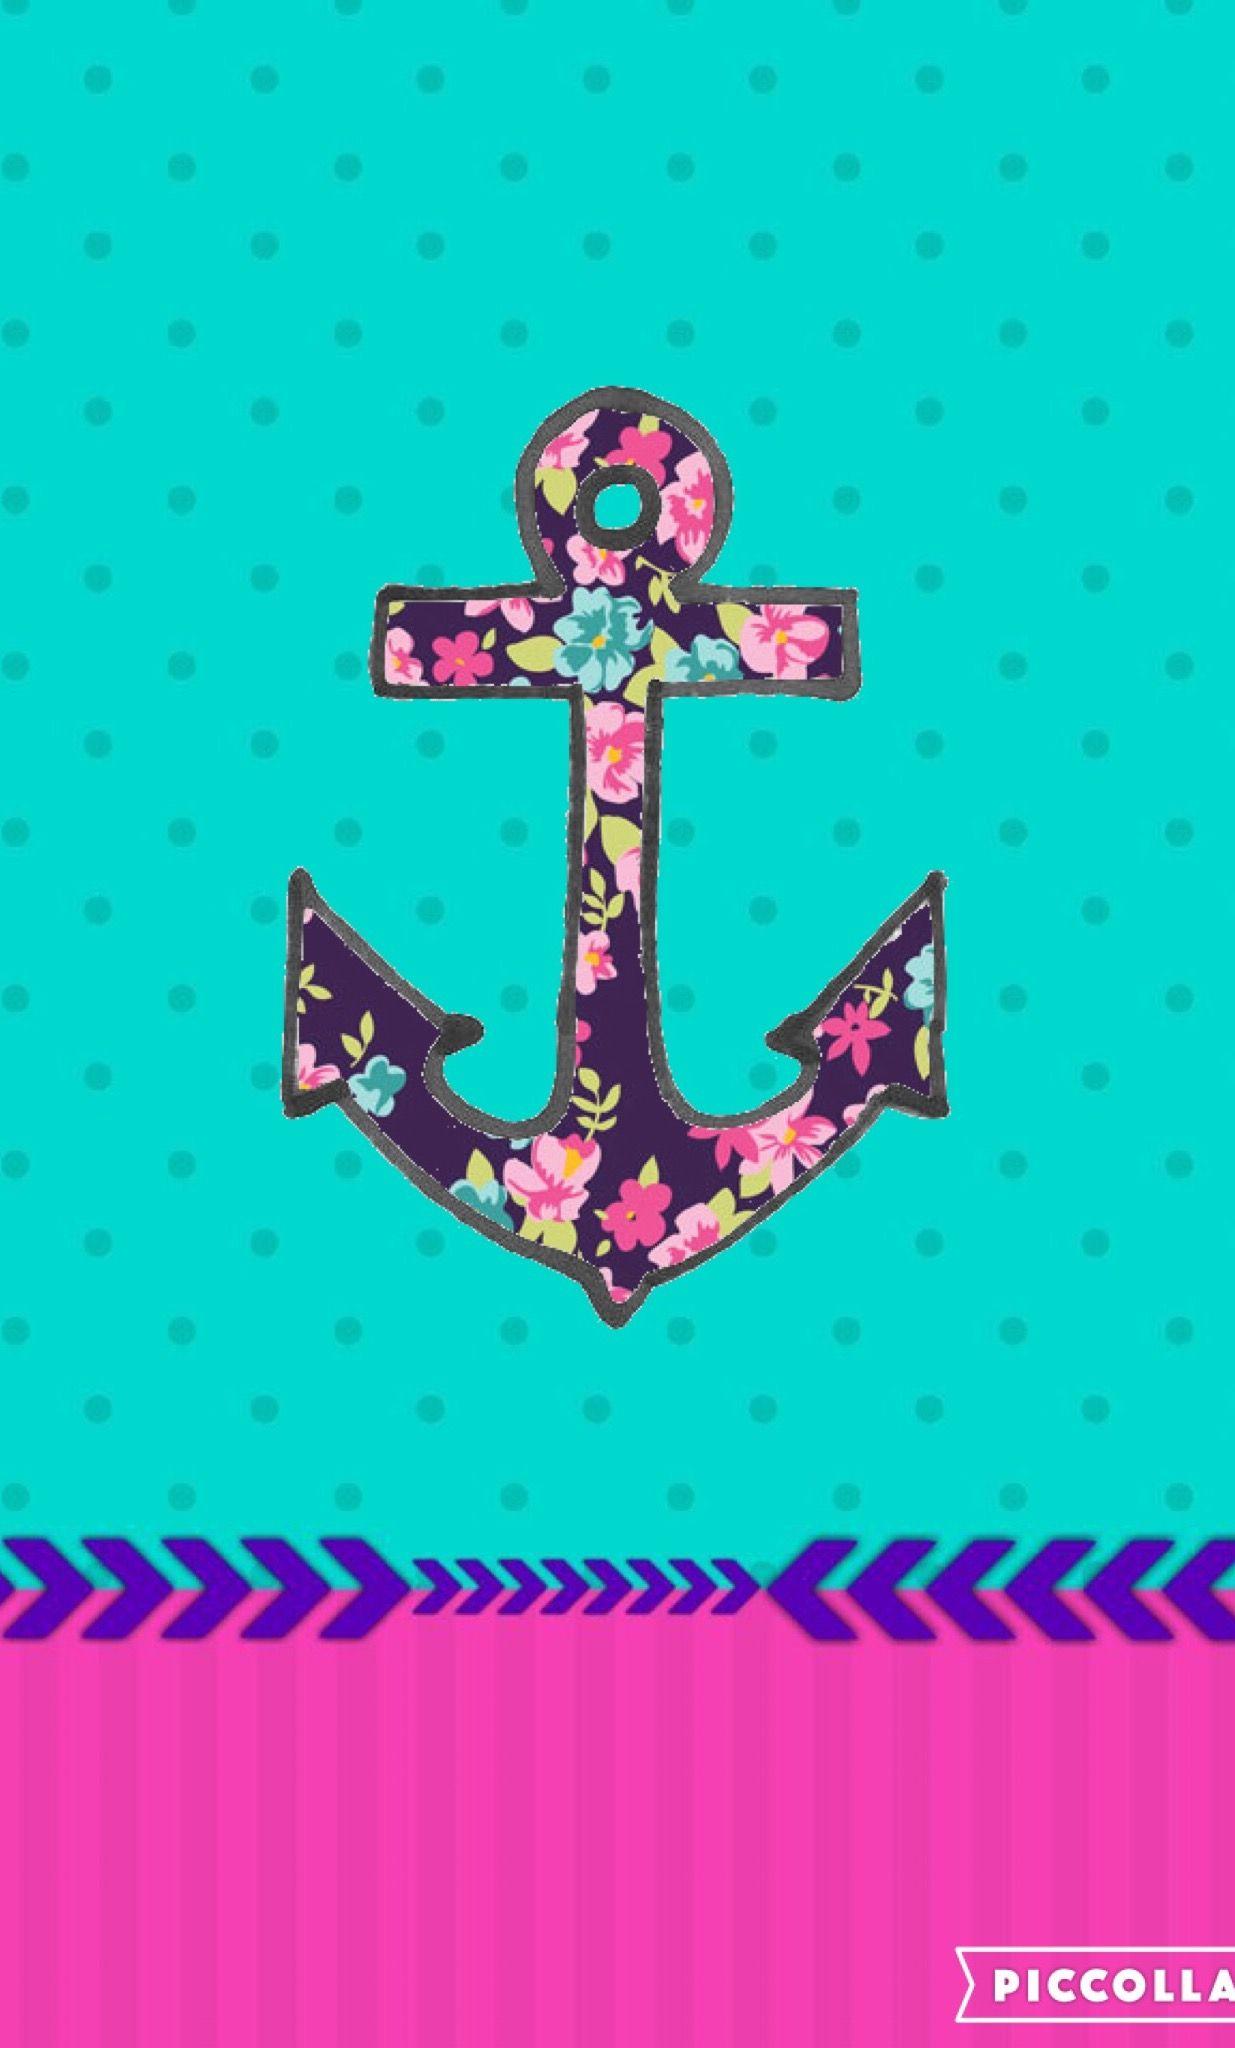 Anchor Cute Girly Anchor Wallpaper Cross Wallpaper Funny Phone Wallpaper